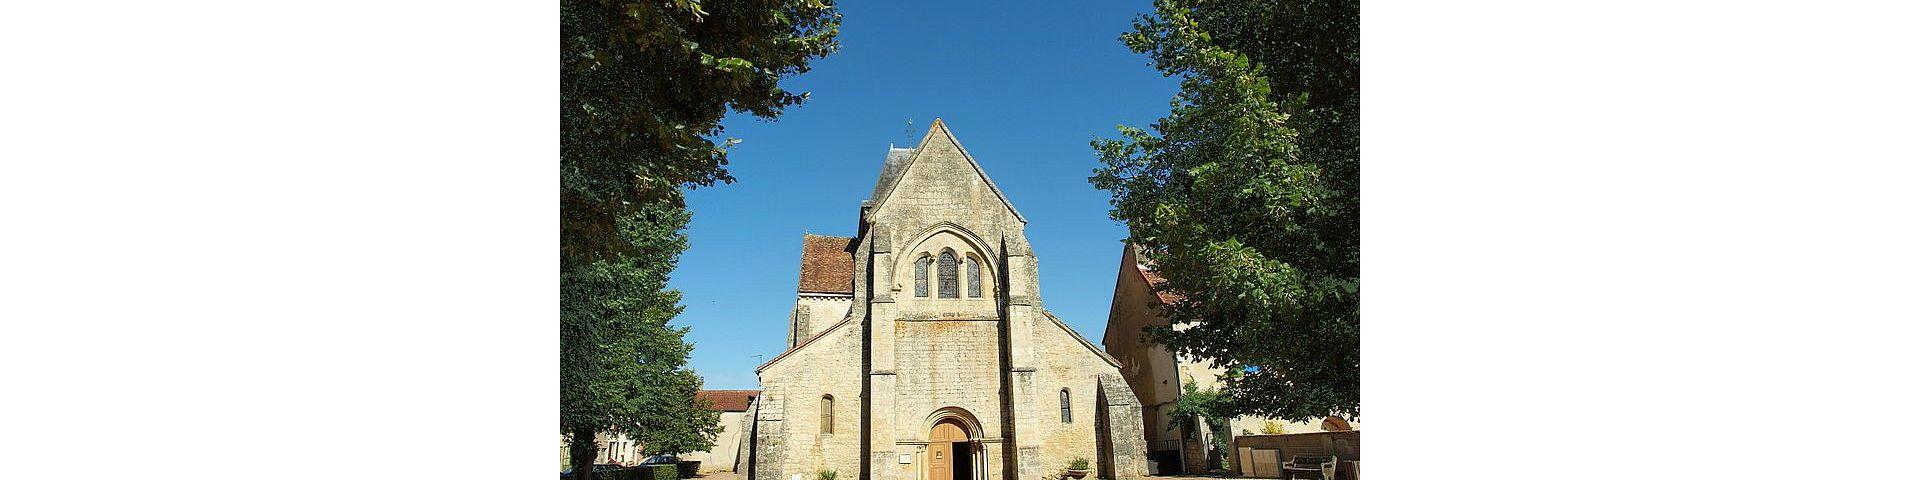 St-Vérain - Eglise (58)